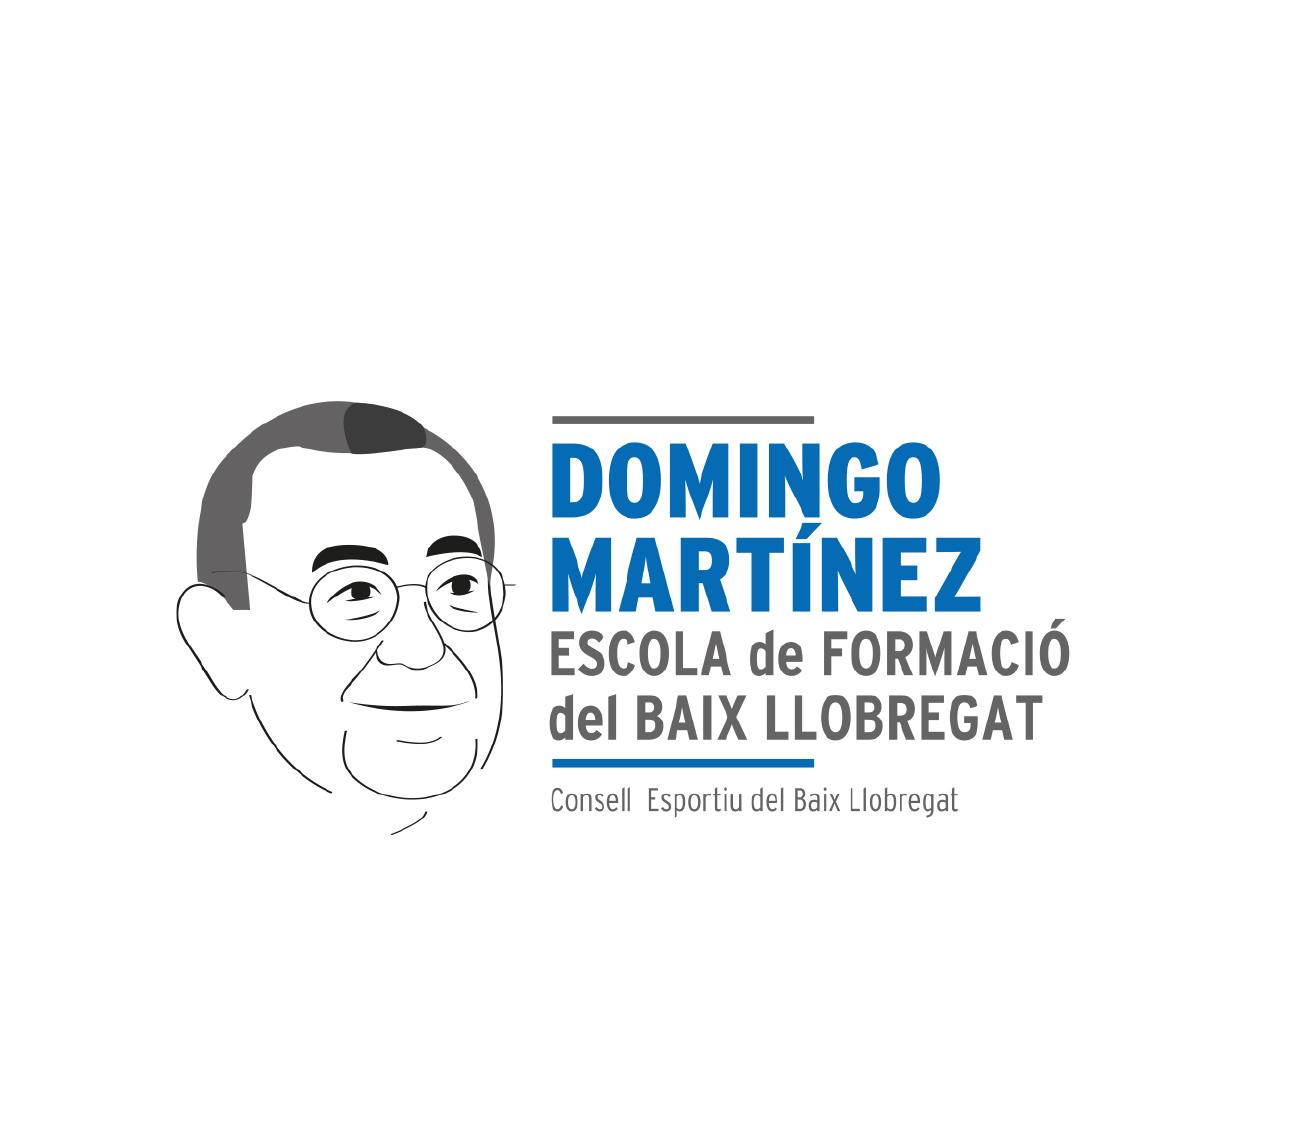 Domingo Martínez